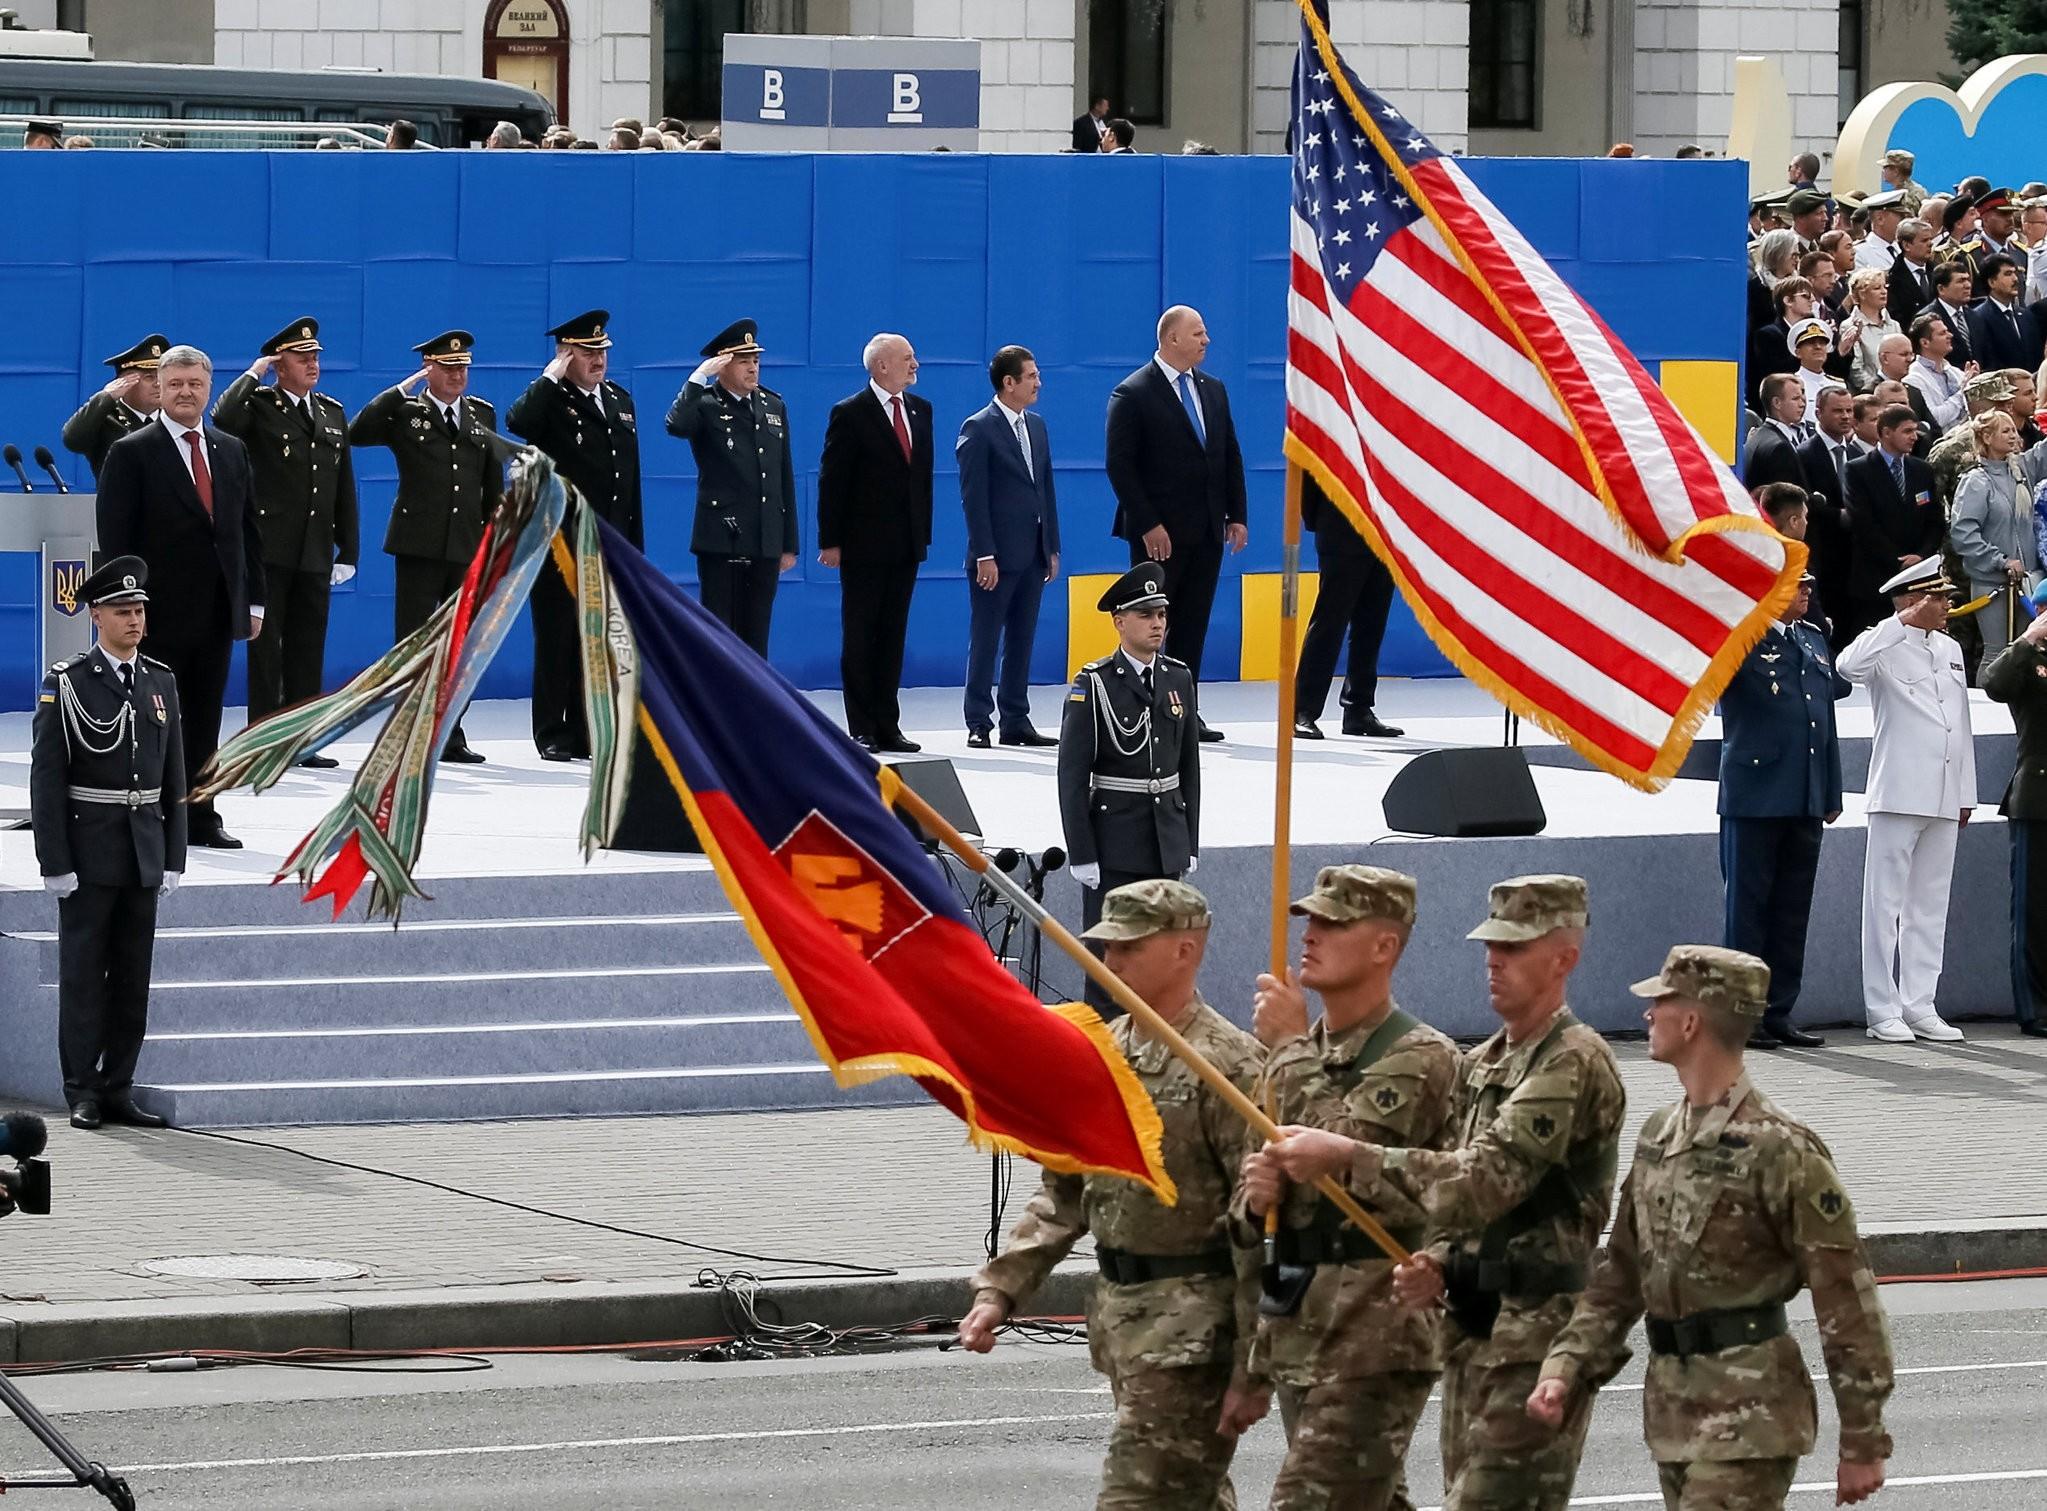 U.S. servicemen march as Ukrainian President Petro Poroshenko looks on during a military parade marking Ukraine's Independence Day in Kiev, Ukraine August 24, 2017. (Reuters Photo)